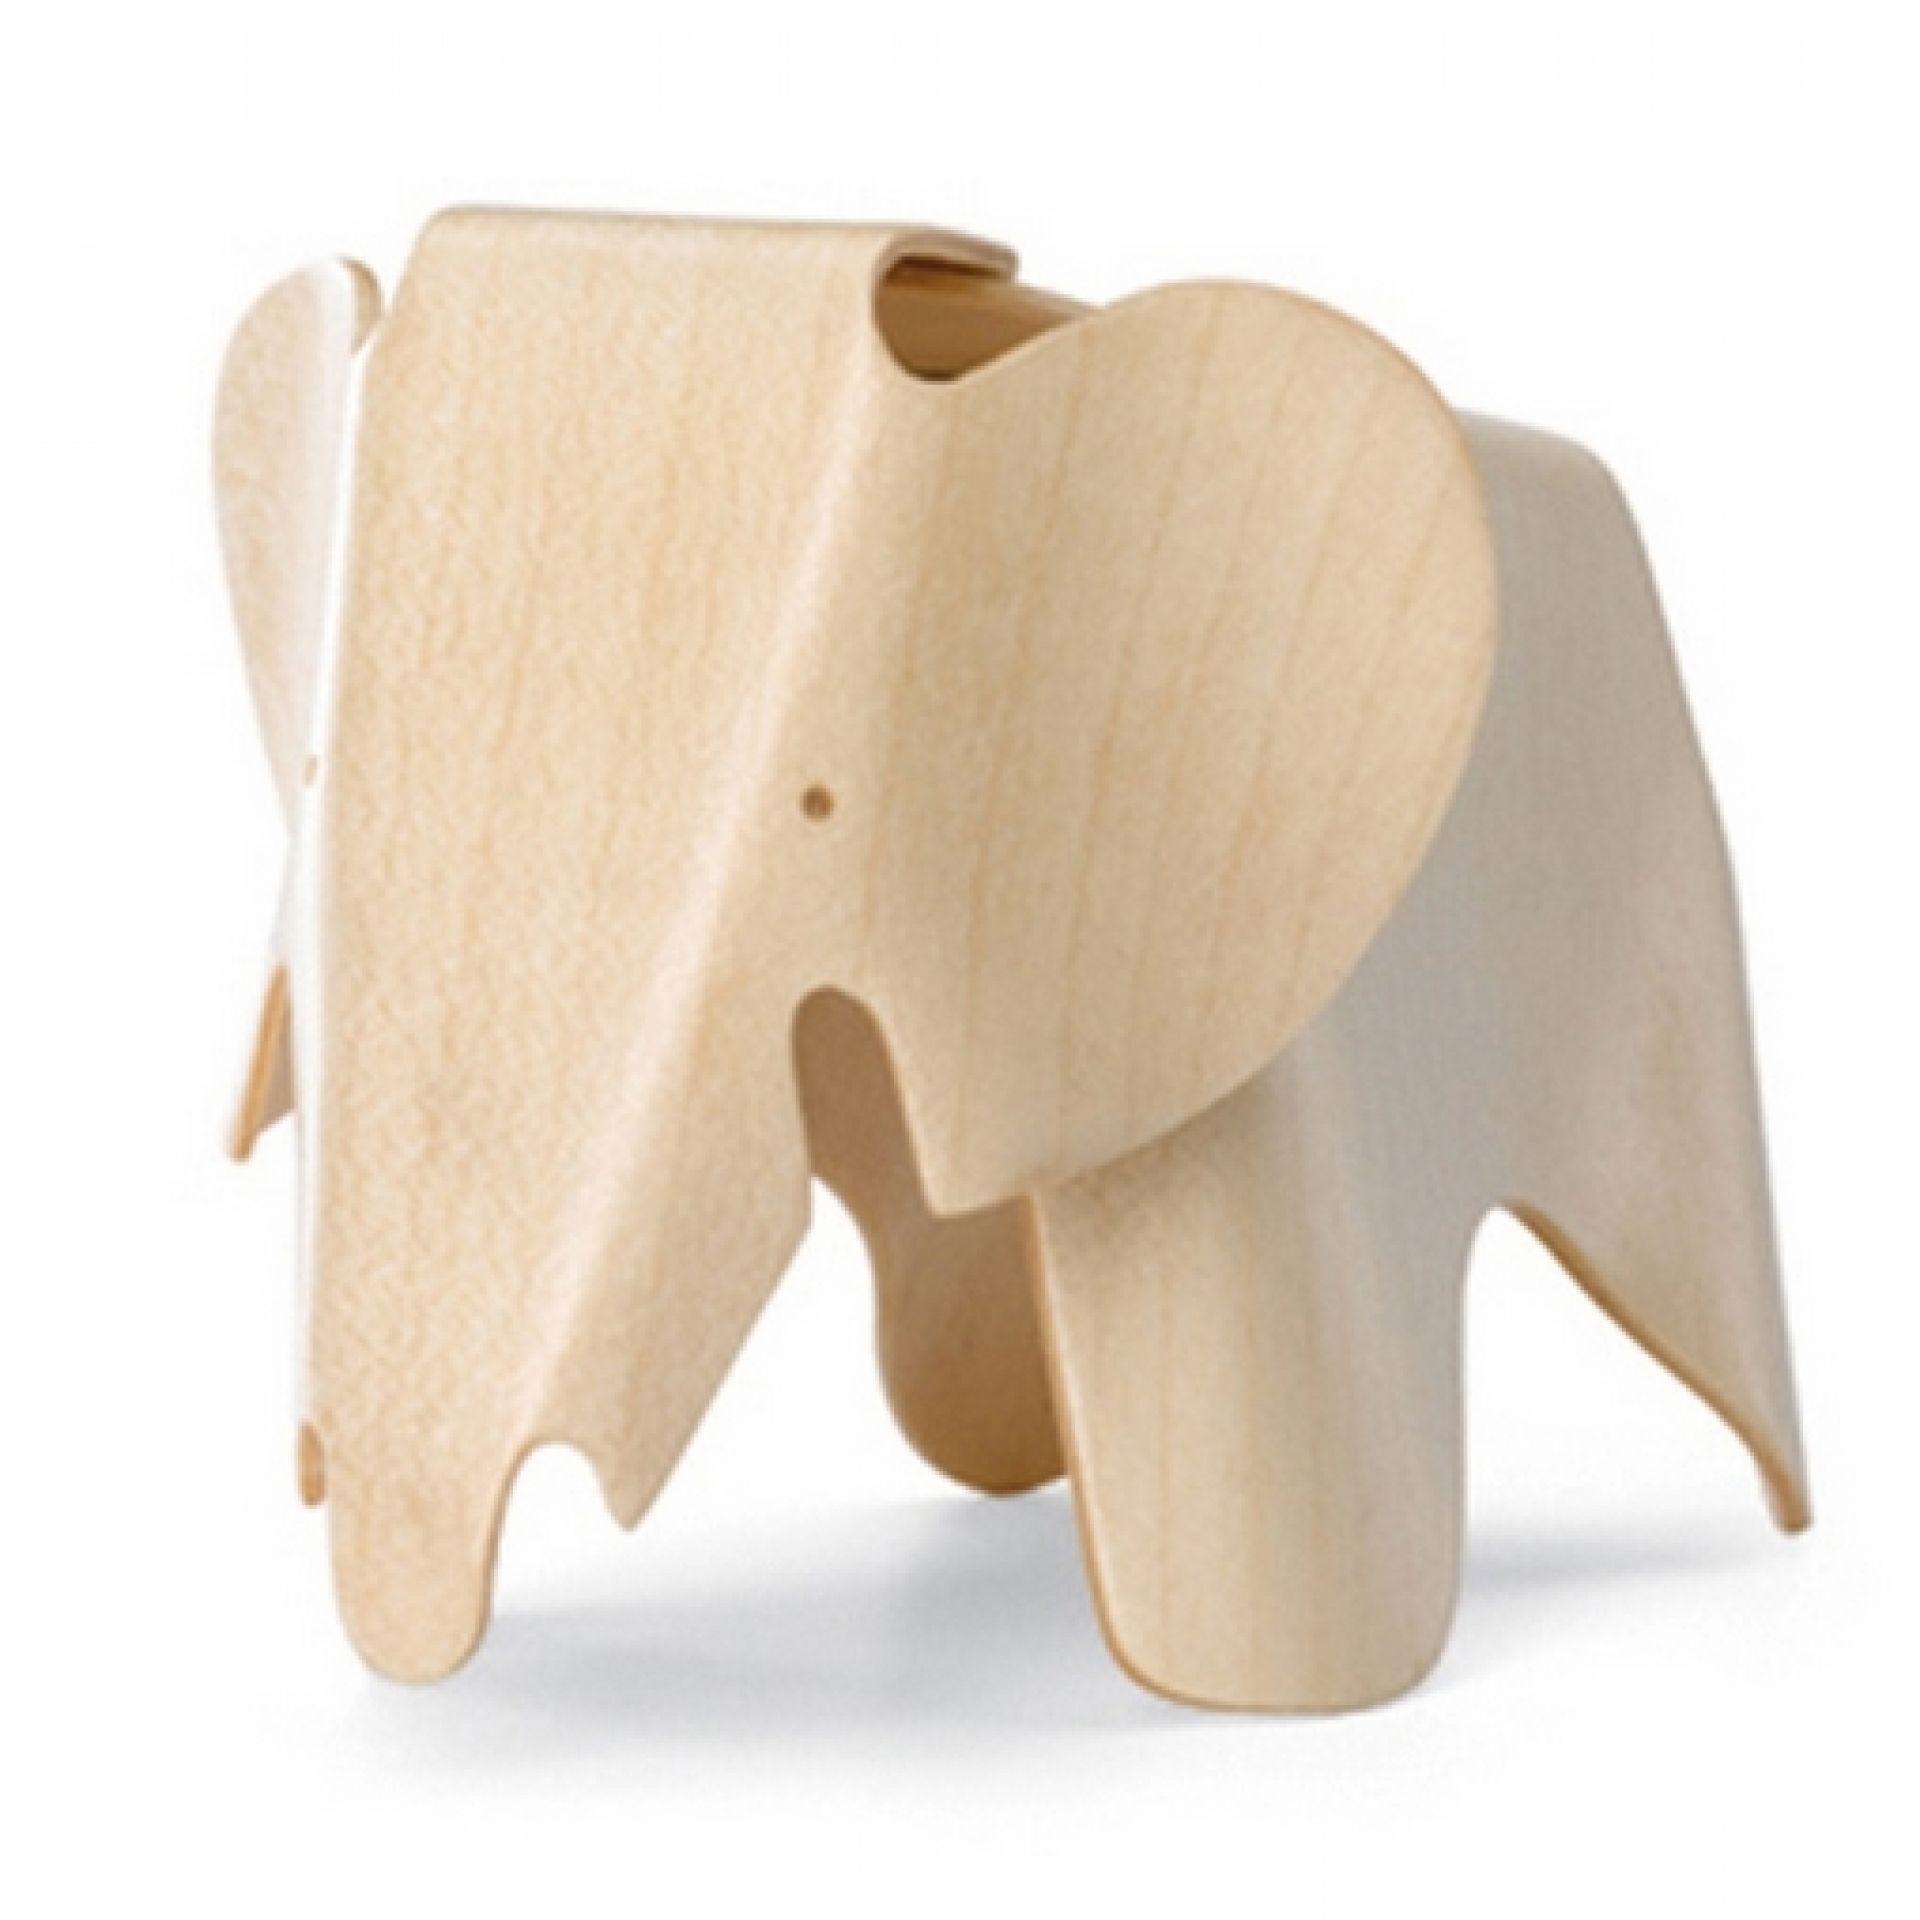 Plywood Elephant Miniatur (1945) Vitra